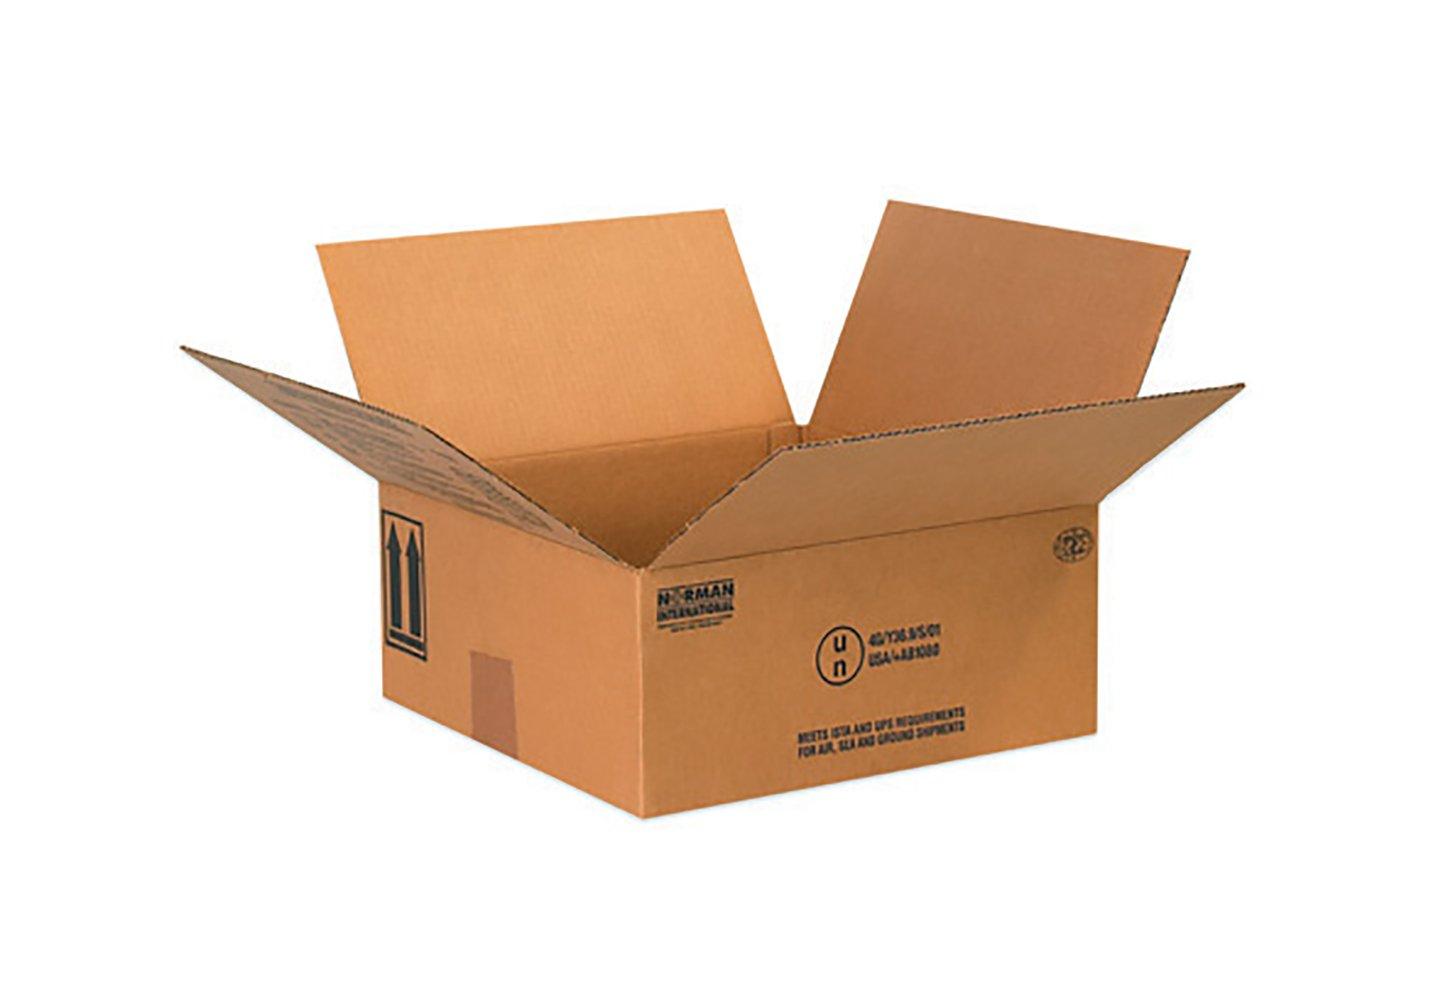 RetailSource B101006HM300 Hazmat Box, 6.1875'' Height, 10.25'' Width, 10.25'' Length, Brown (Pack of 300)